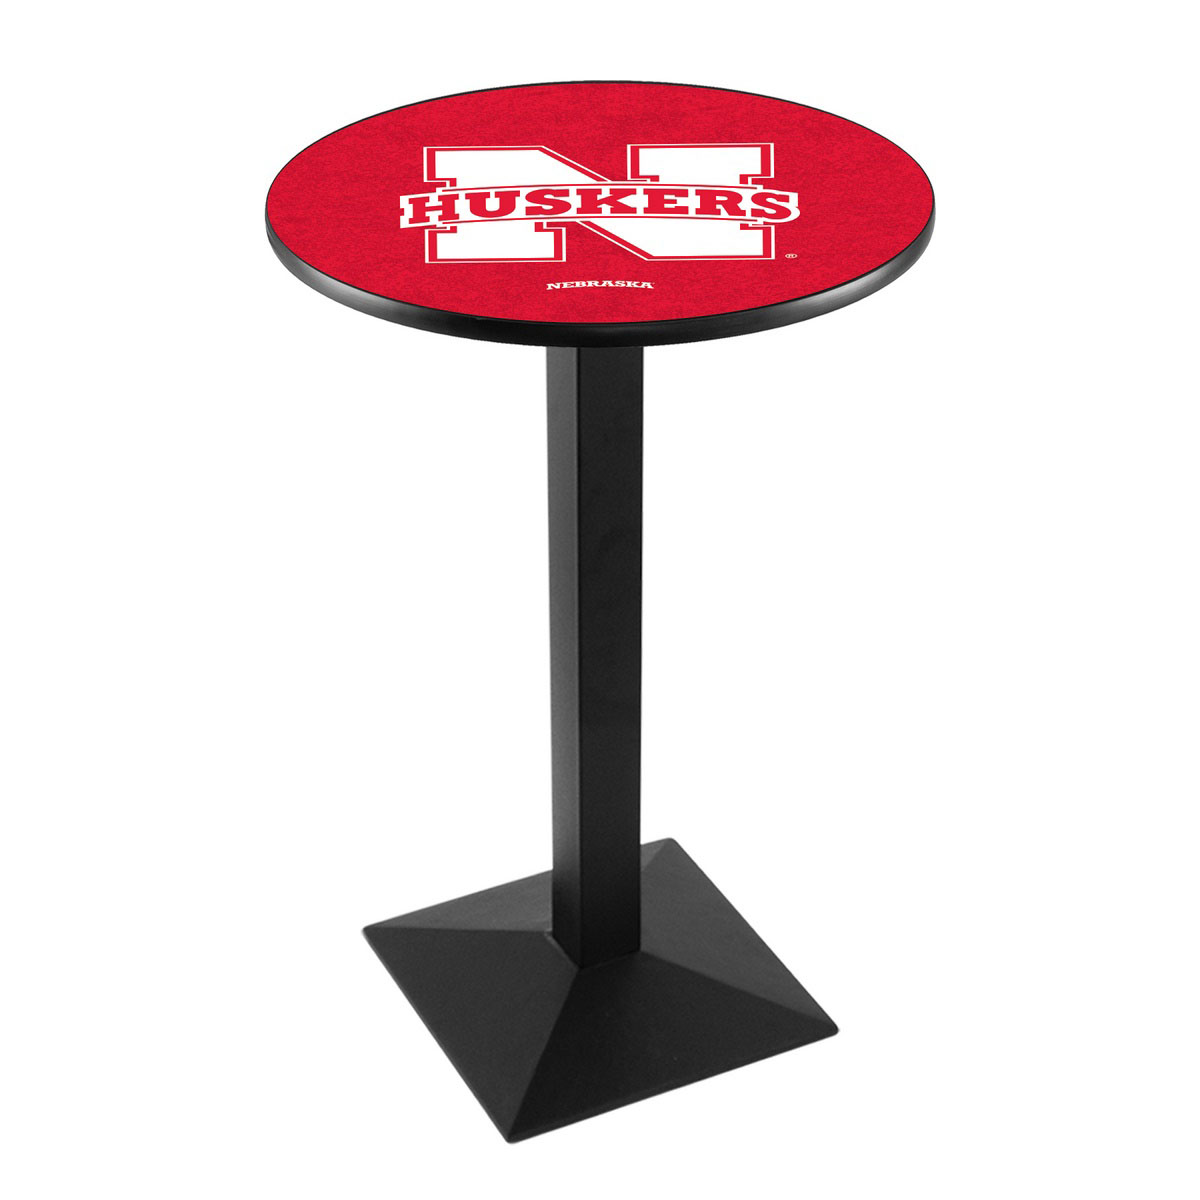 Design University Nebraska Logo Pub Bar Table Square Stand Product Photo